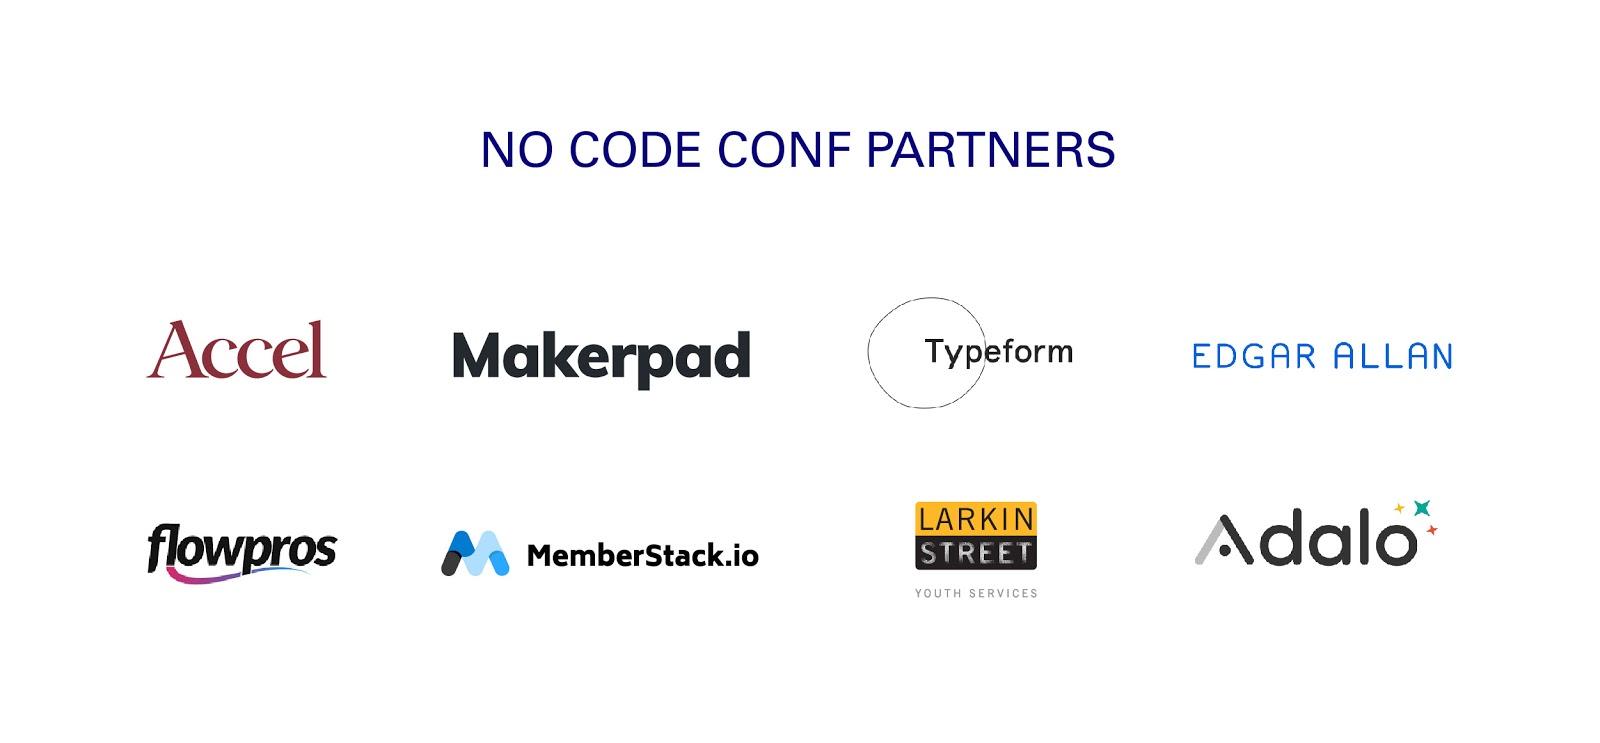 no code conf partners